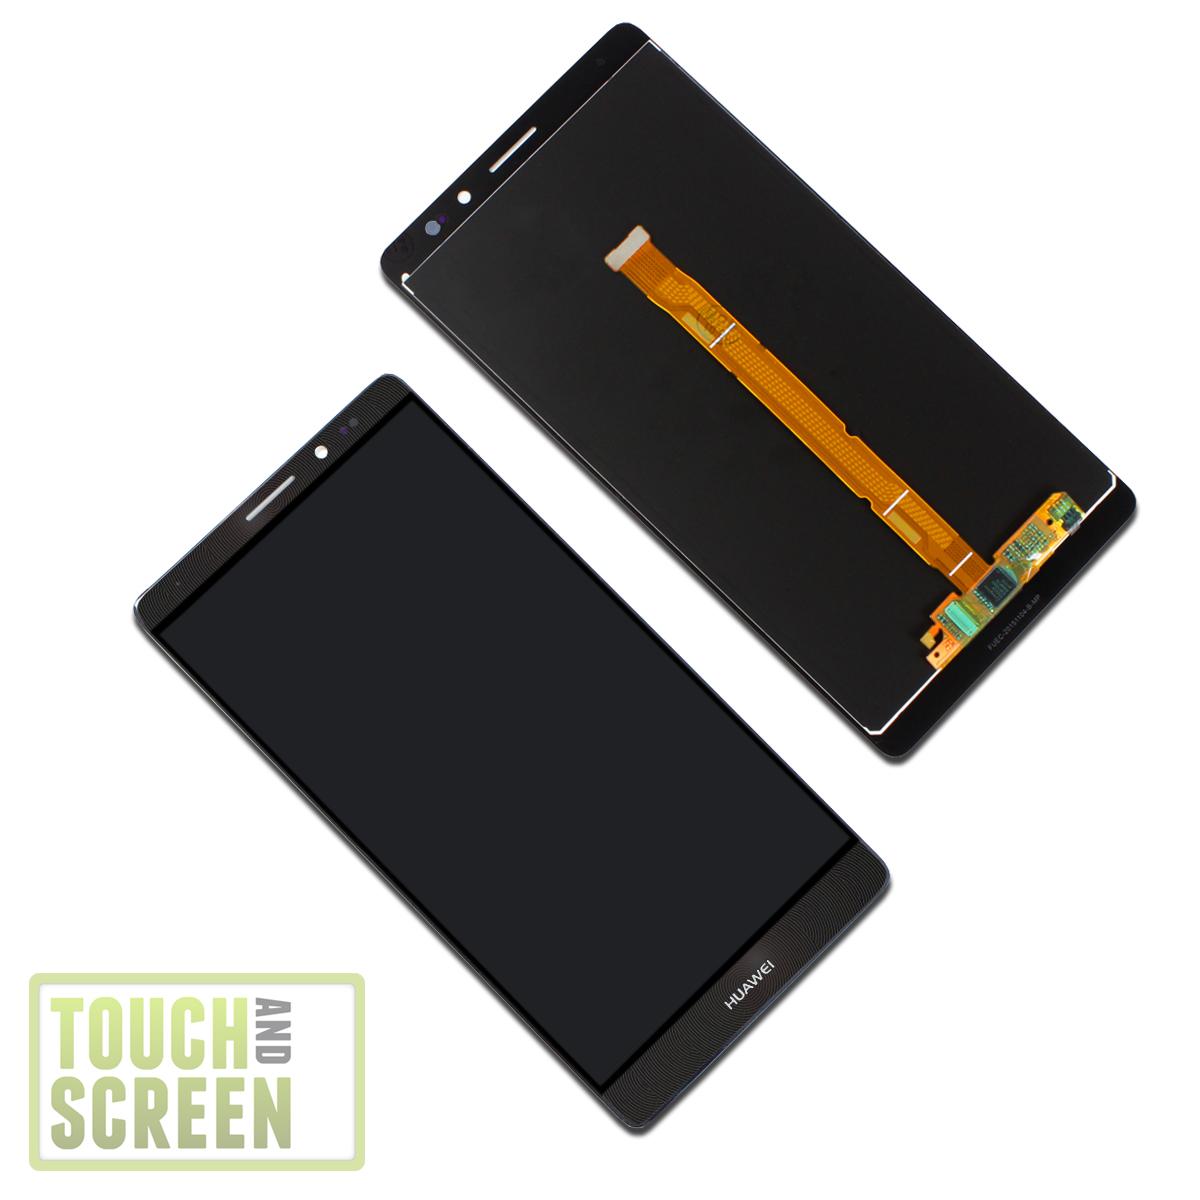 orig huawei ascend mate 8 display modul mit rahmen screen schwarz inkl werkzeug ebay. Black Bedroom Furniture Sets. Home Design Ideas